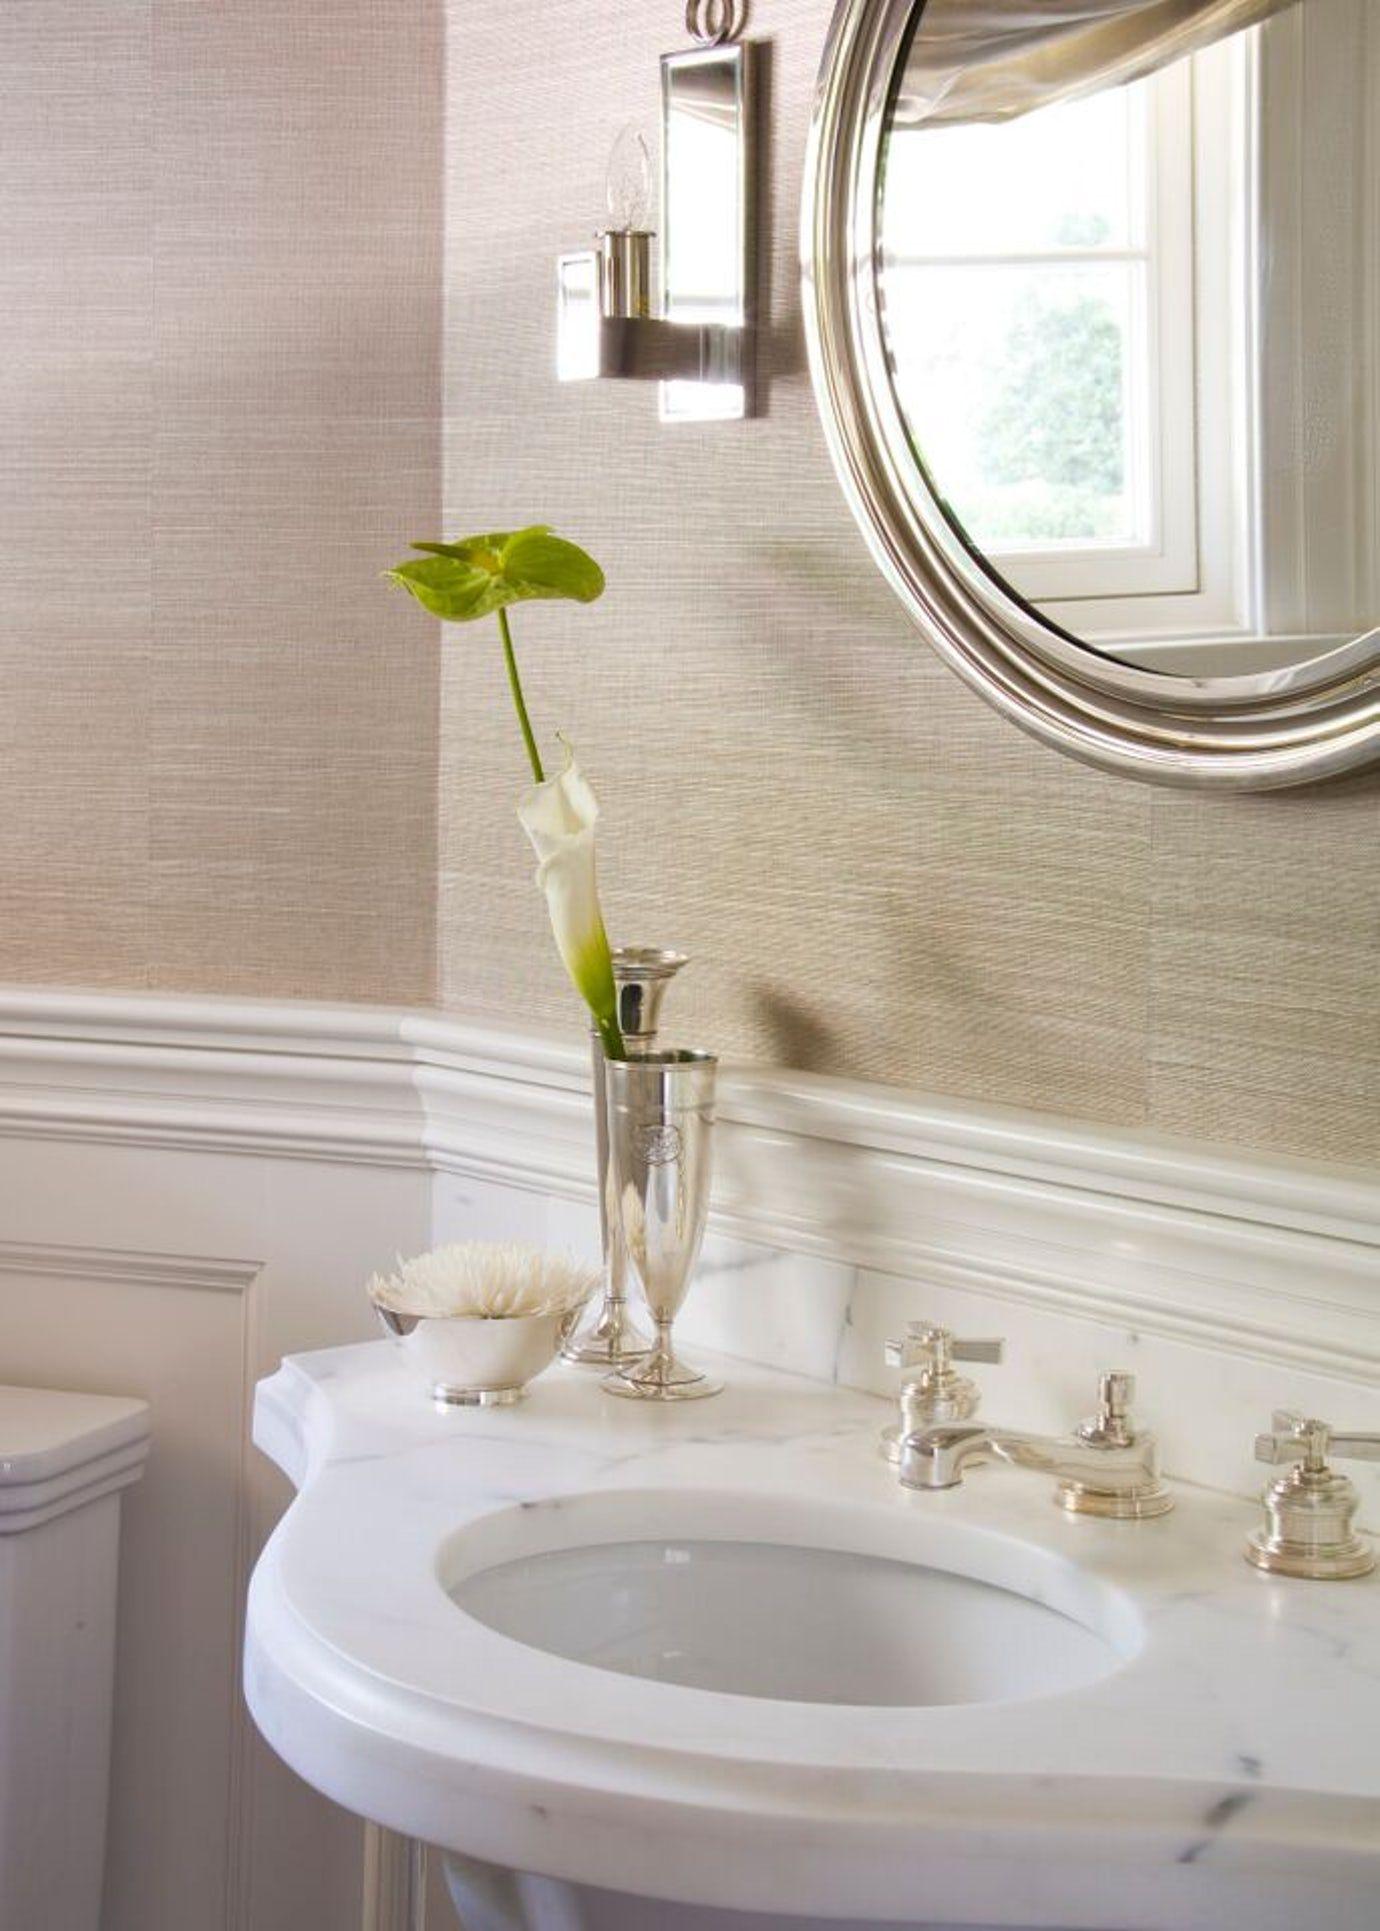 Grasscloth wallpaper is a subtle nod to the home's coastal